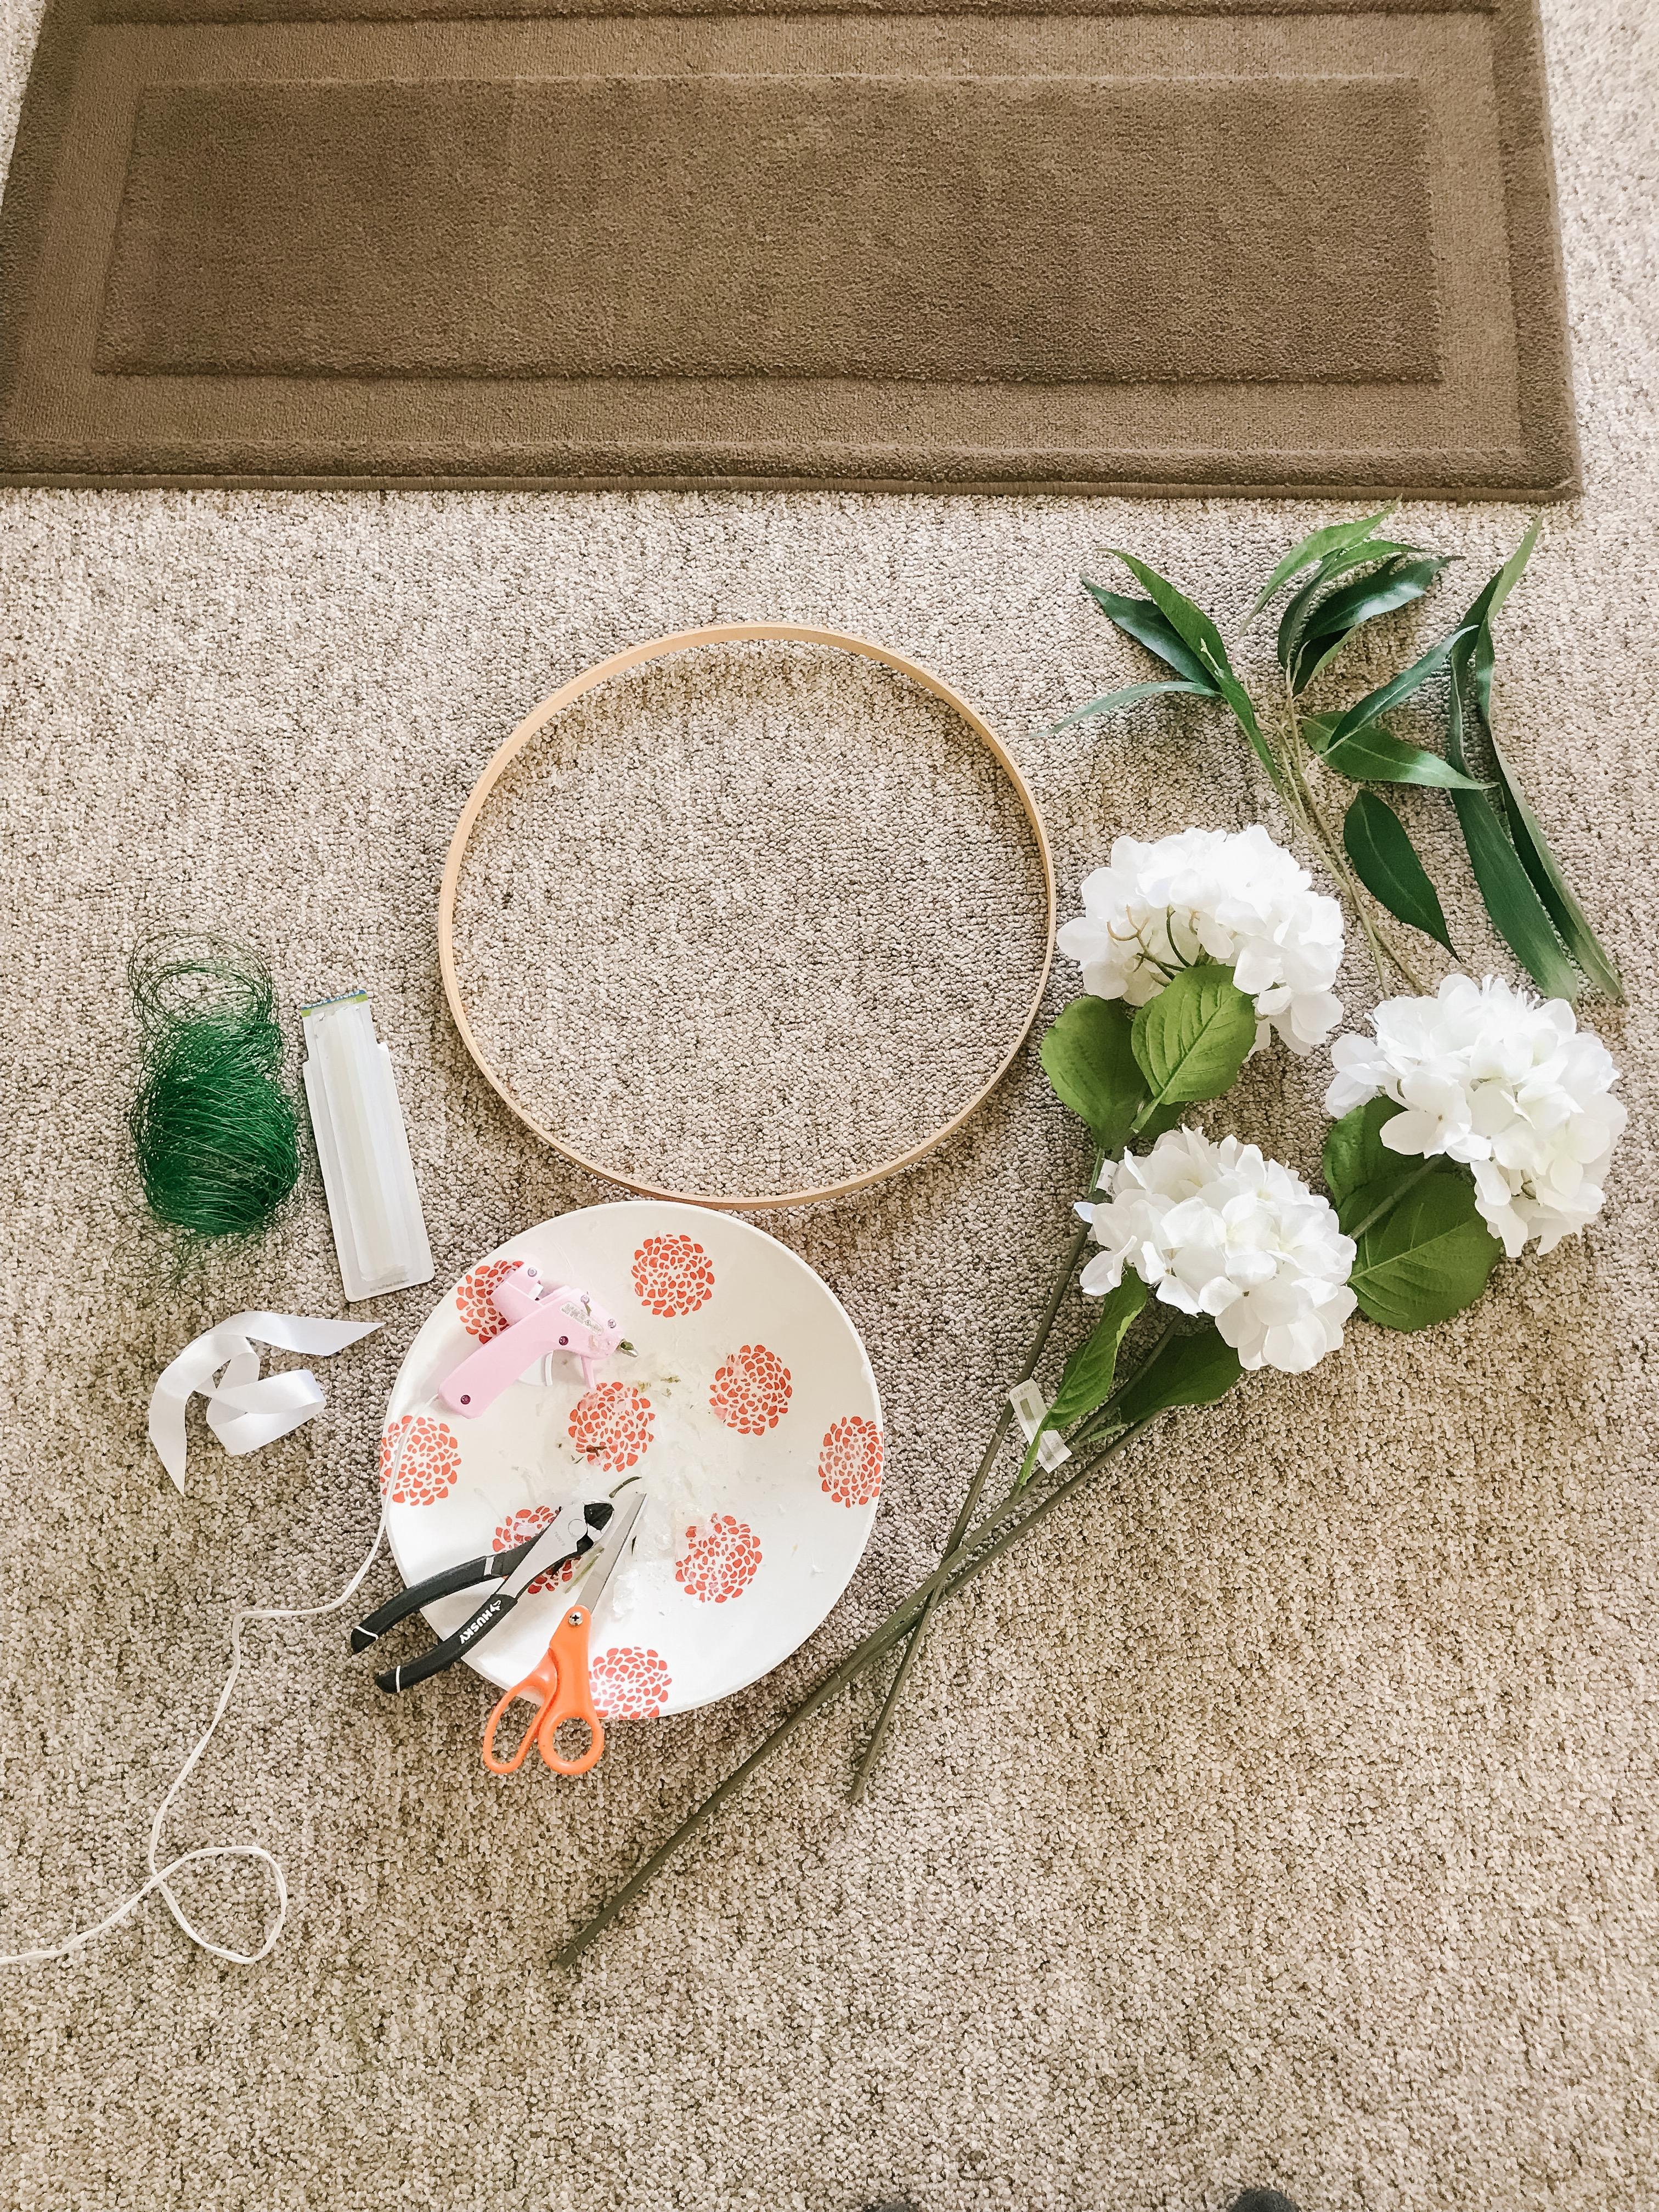 Jamie Krause, Home Living, Crafts, Wreath, Seasonal, Tutorial, DIY, Kelowna, Okanagan, Canada, Decorator, Interior Decor, Designer